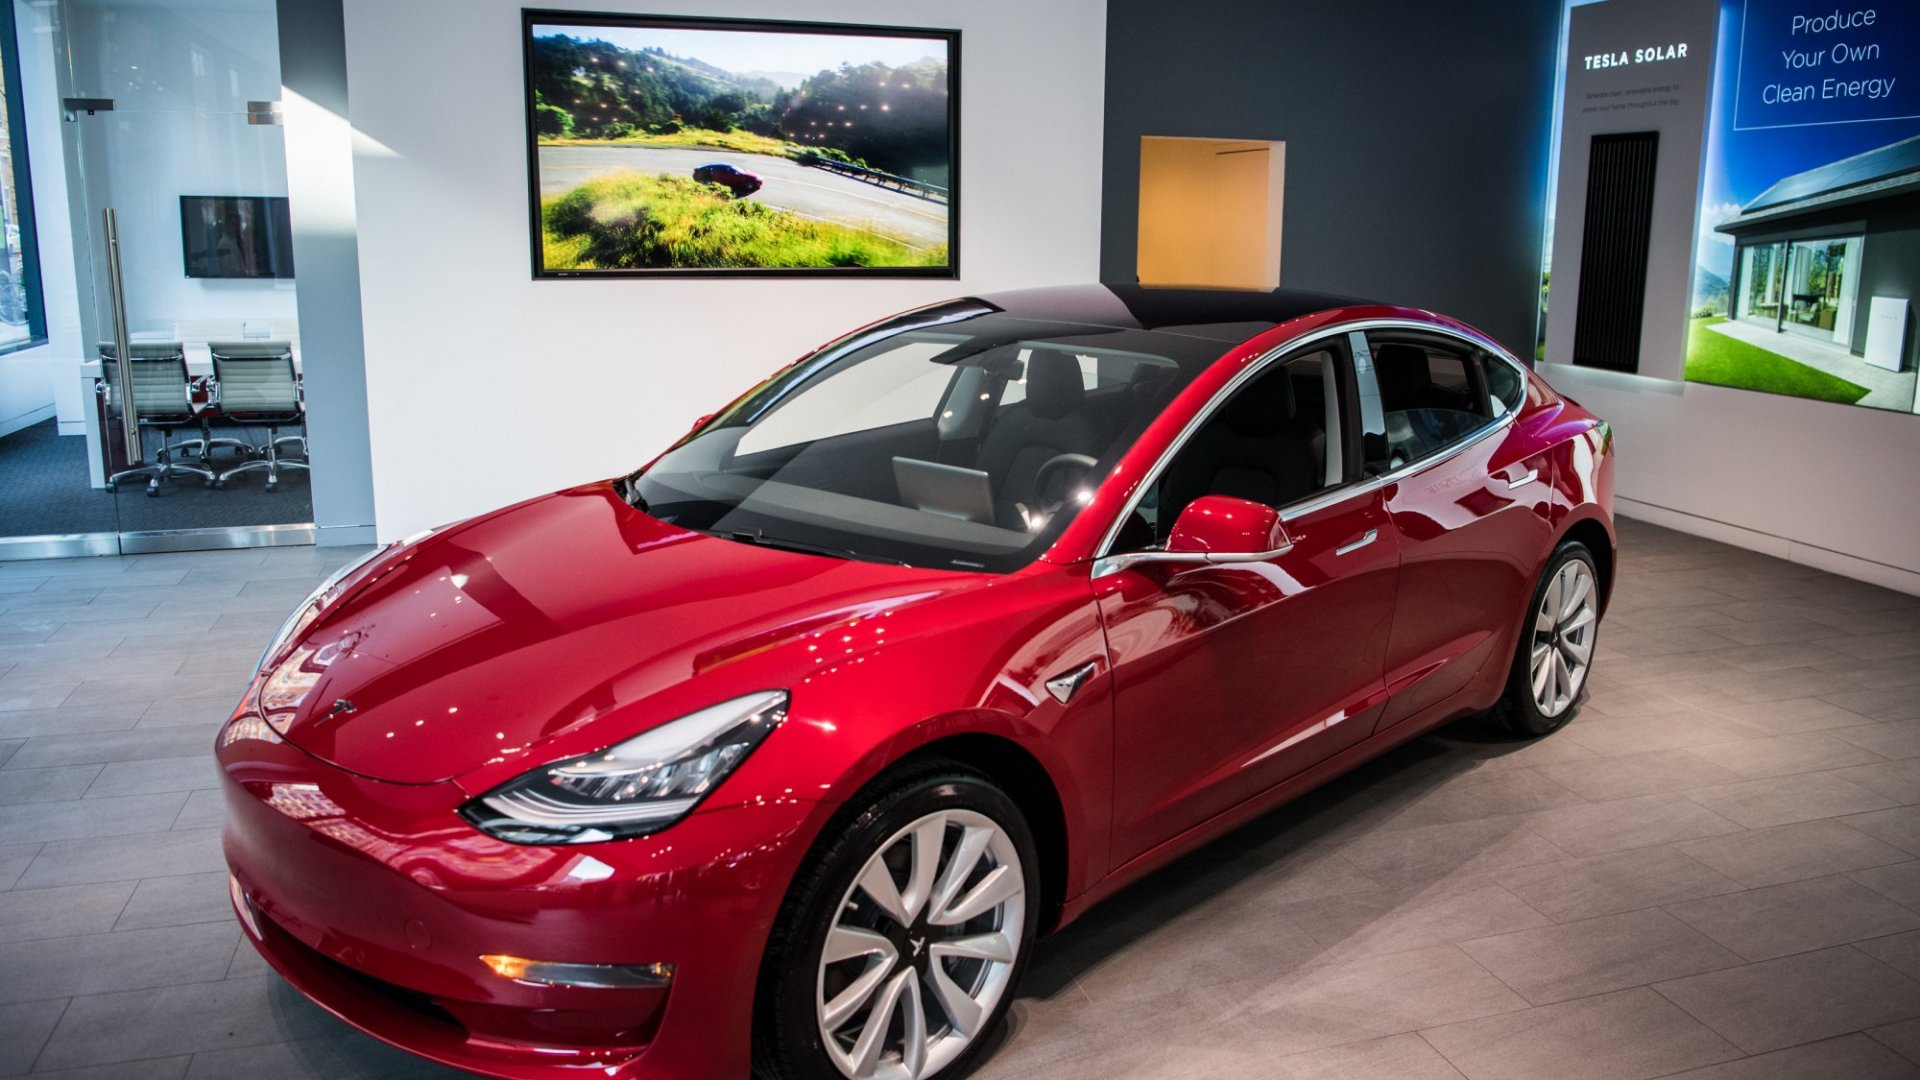 The Smart Reason Why Elon Musk Still Hasn't Made a $35,000 Tesla